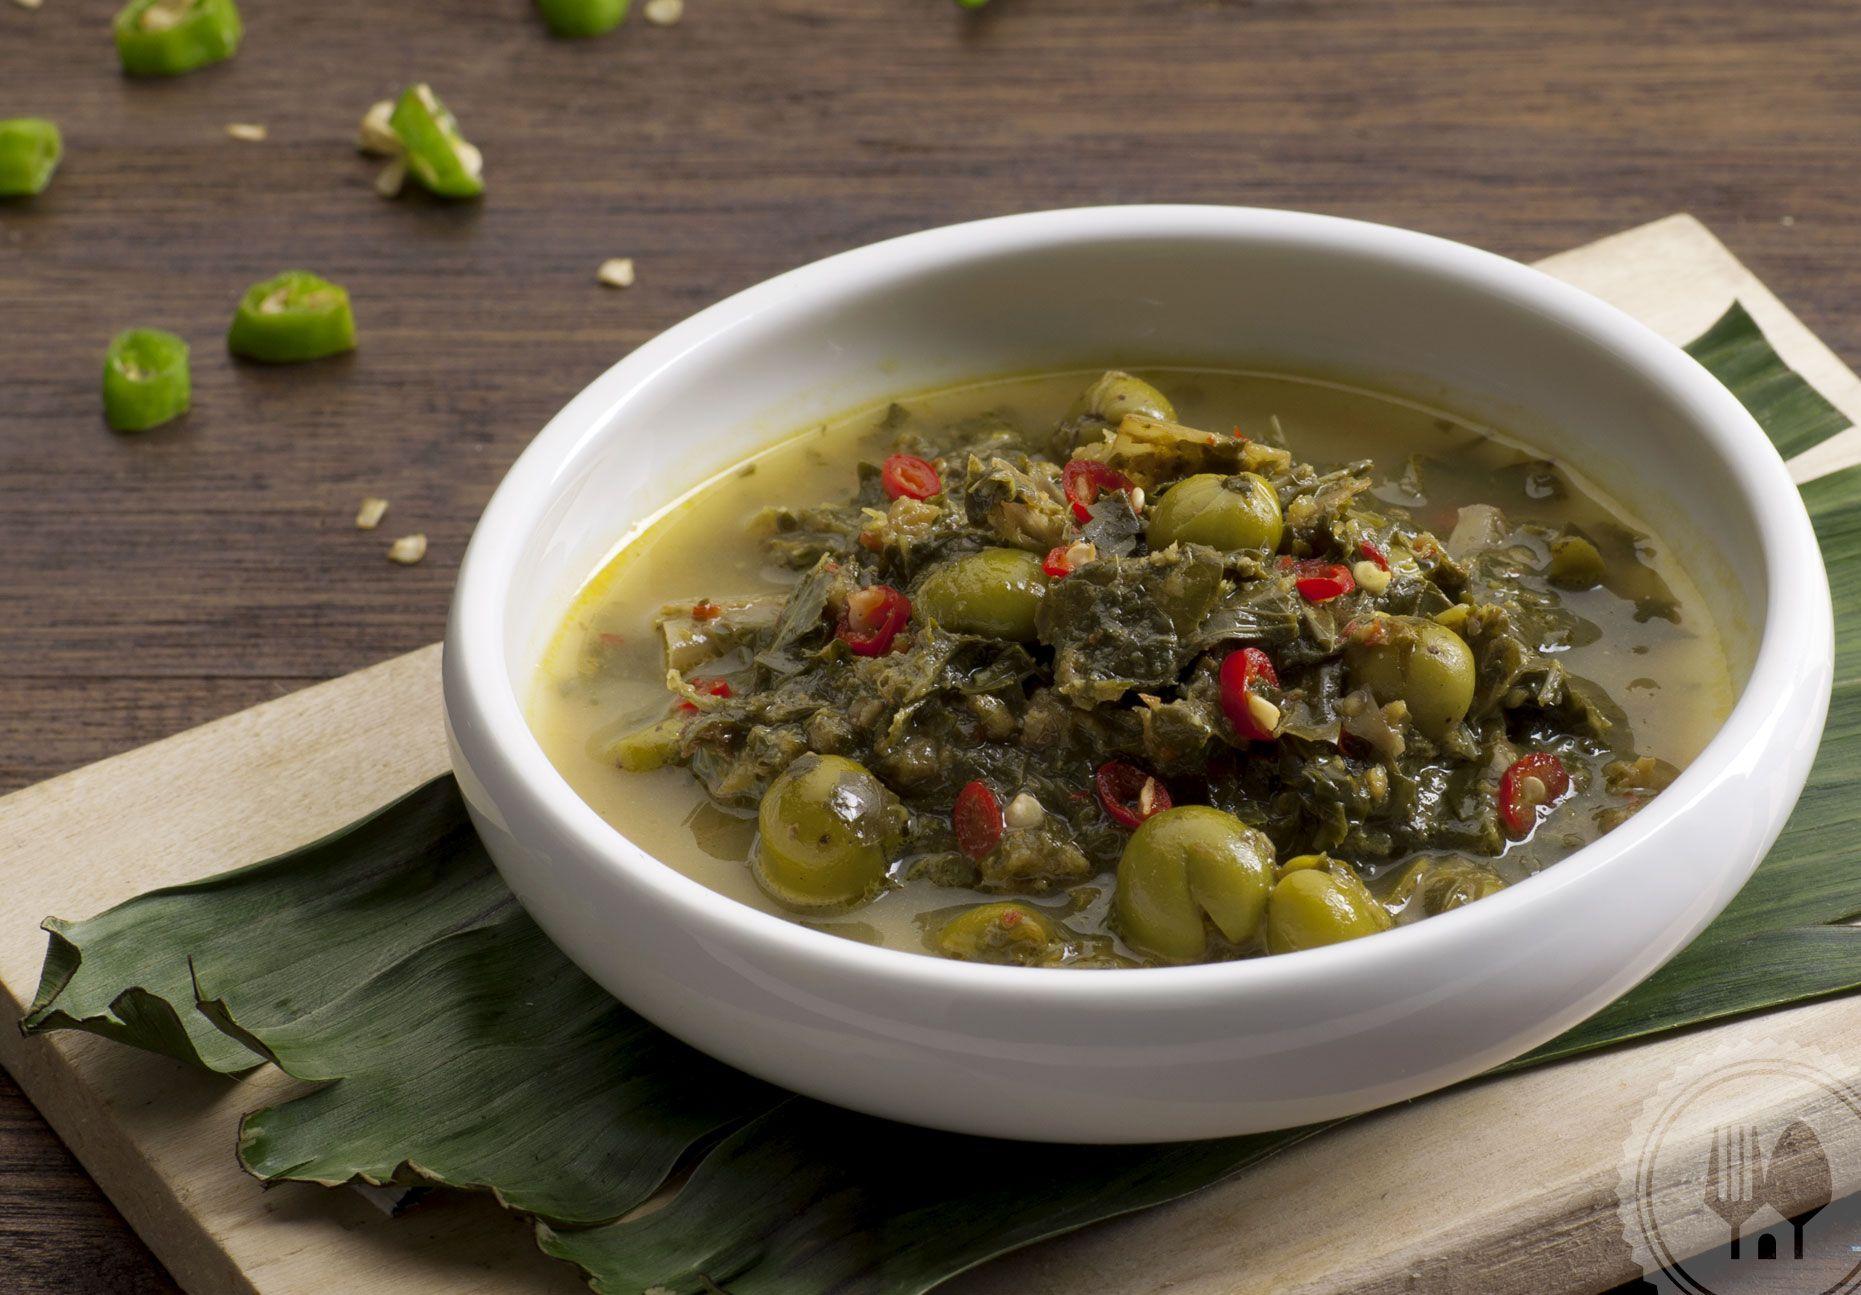 Resep Masakan Sayur Daun Ubi Tumbuk Tapanuli Masakan Sayuran Ubi